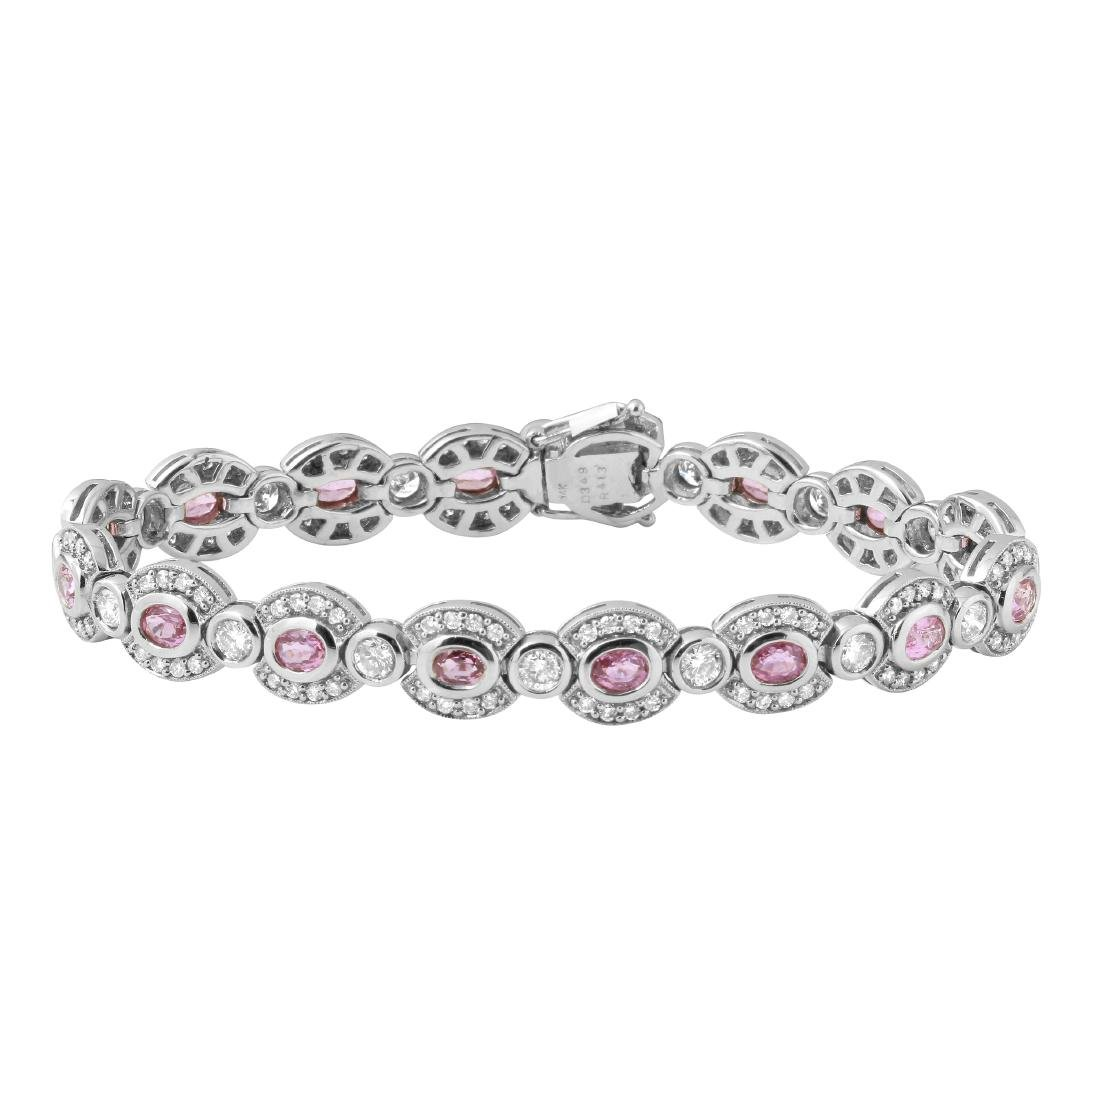 7.62 CTW Pink Sapphire & White Round Diamond Bracelet